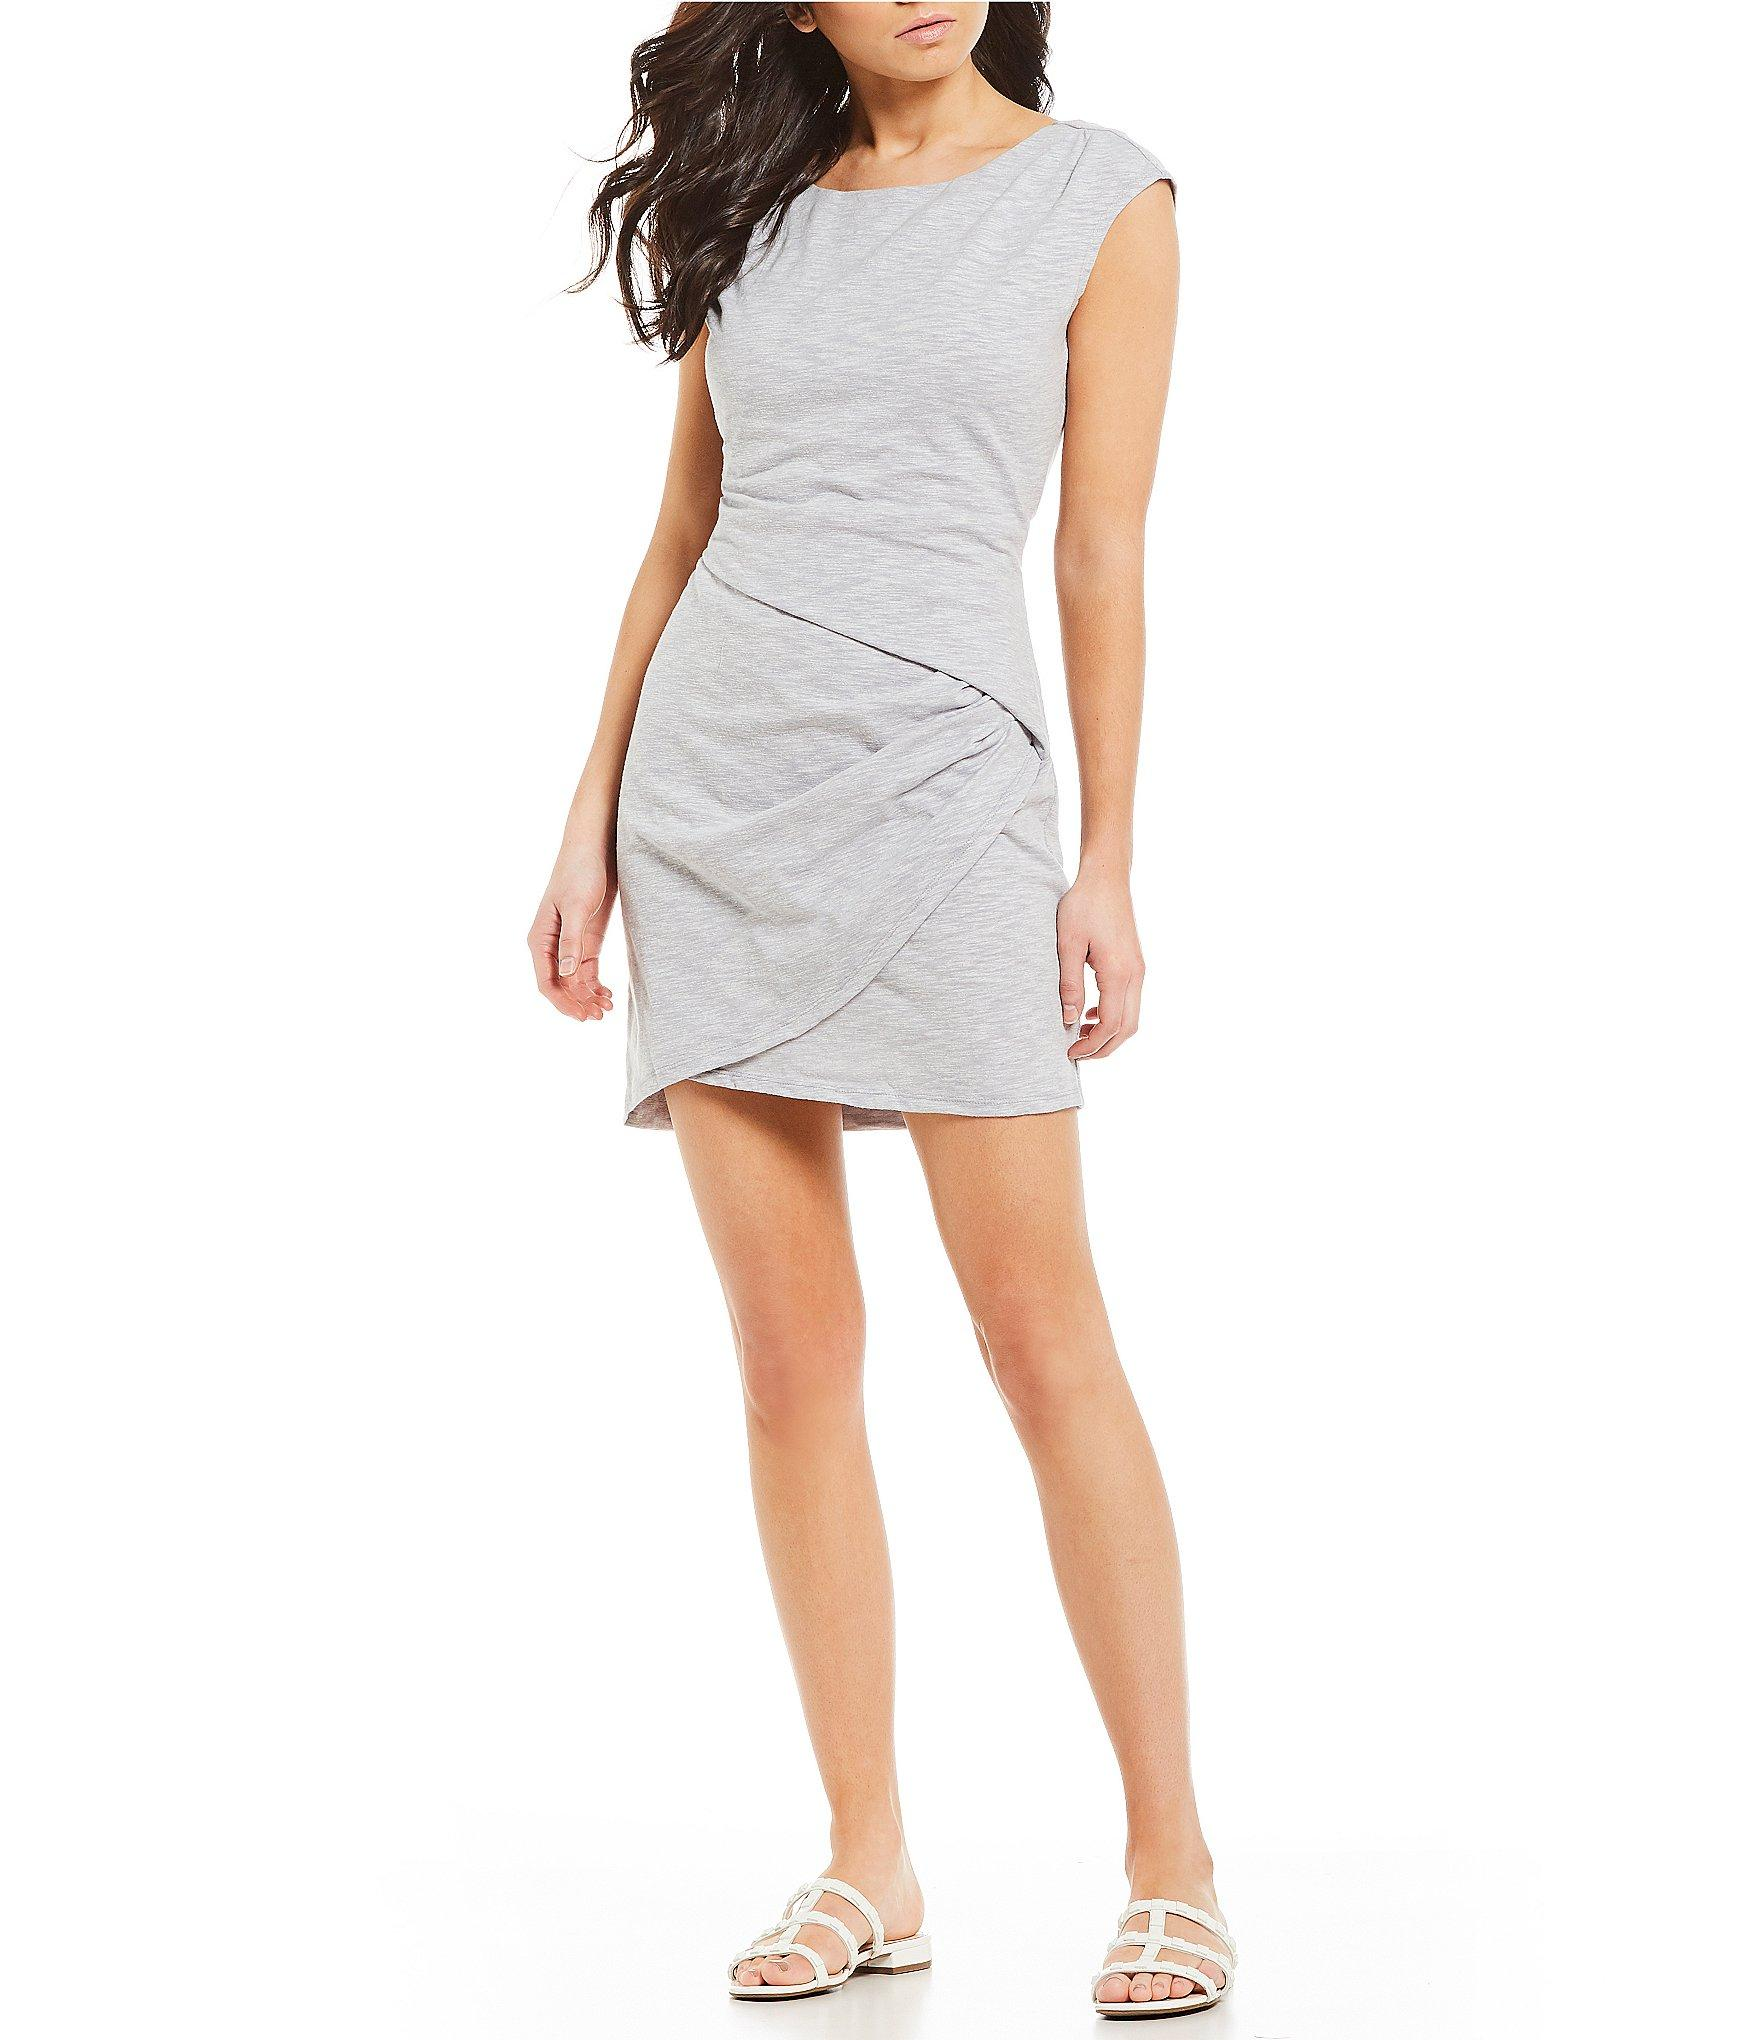 7f19ba16cd0 Lyst - Jessica Simpson Kamile Knit Dress in Gray